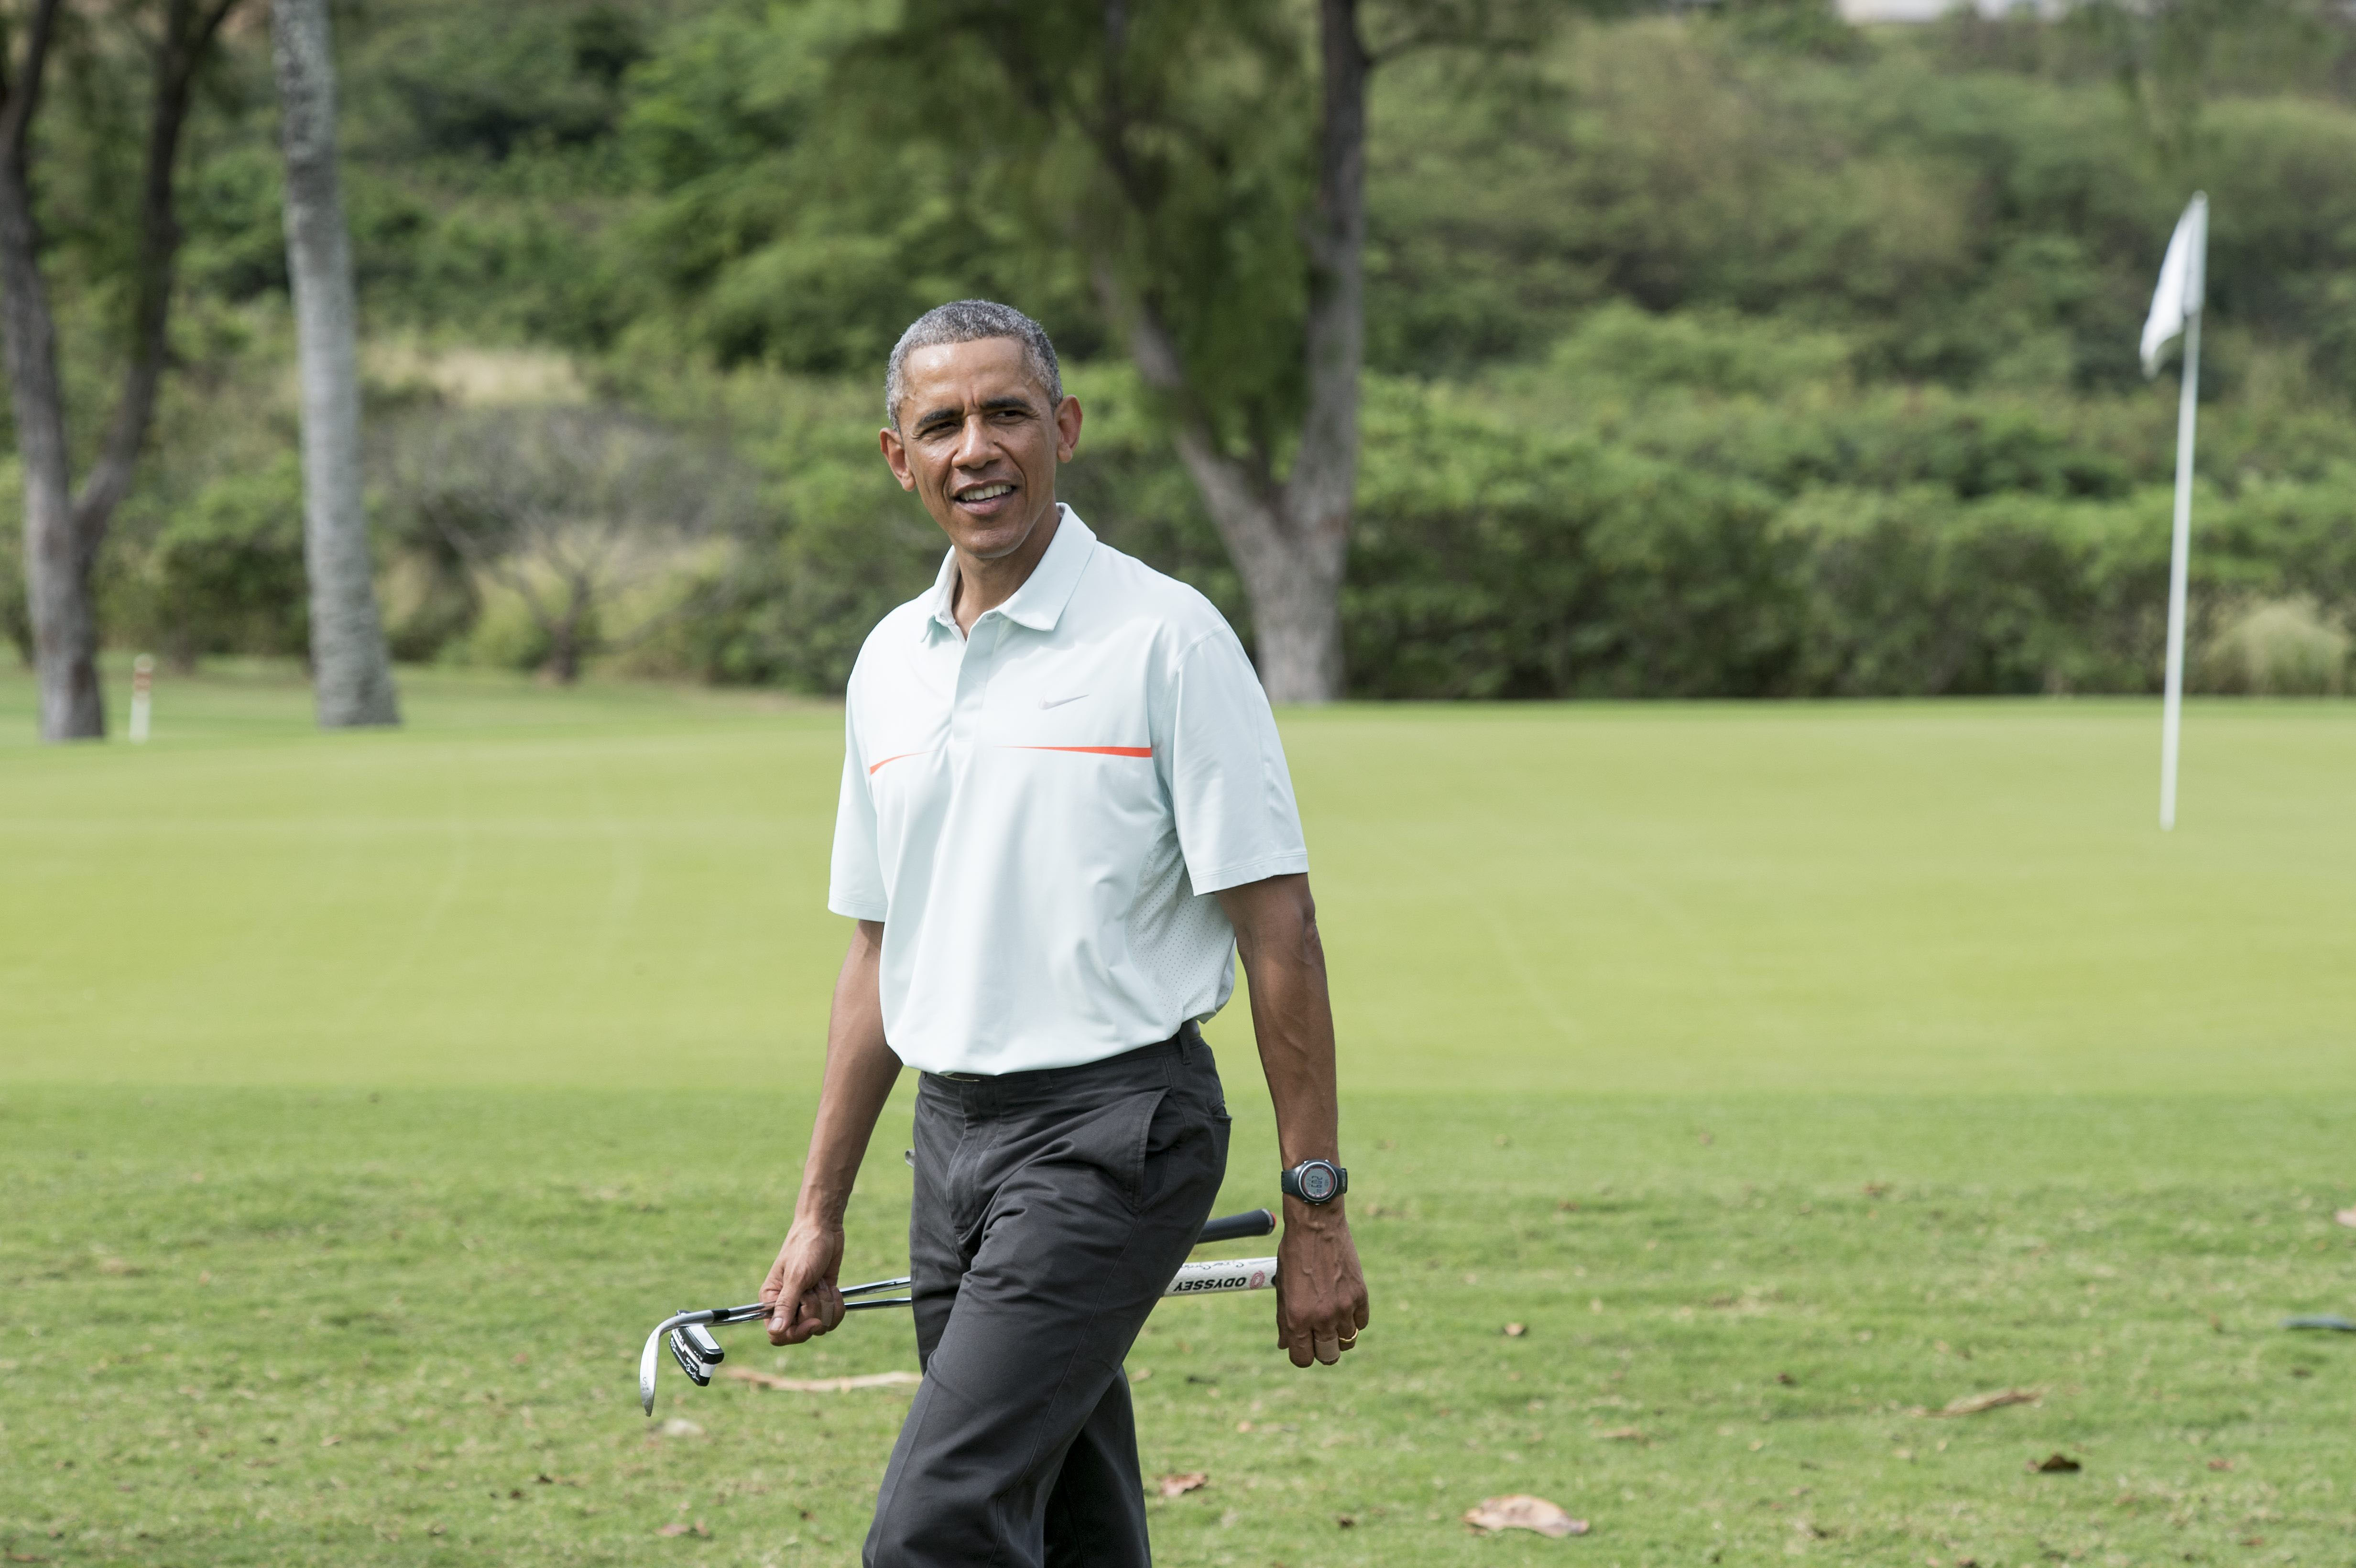 President Barack Obama talks to reporters as he plays golf with Malaysian Prime Minister Najib Razzak.